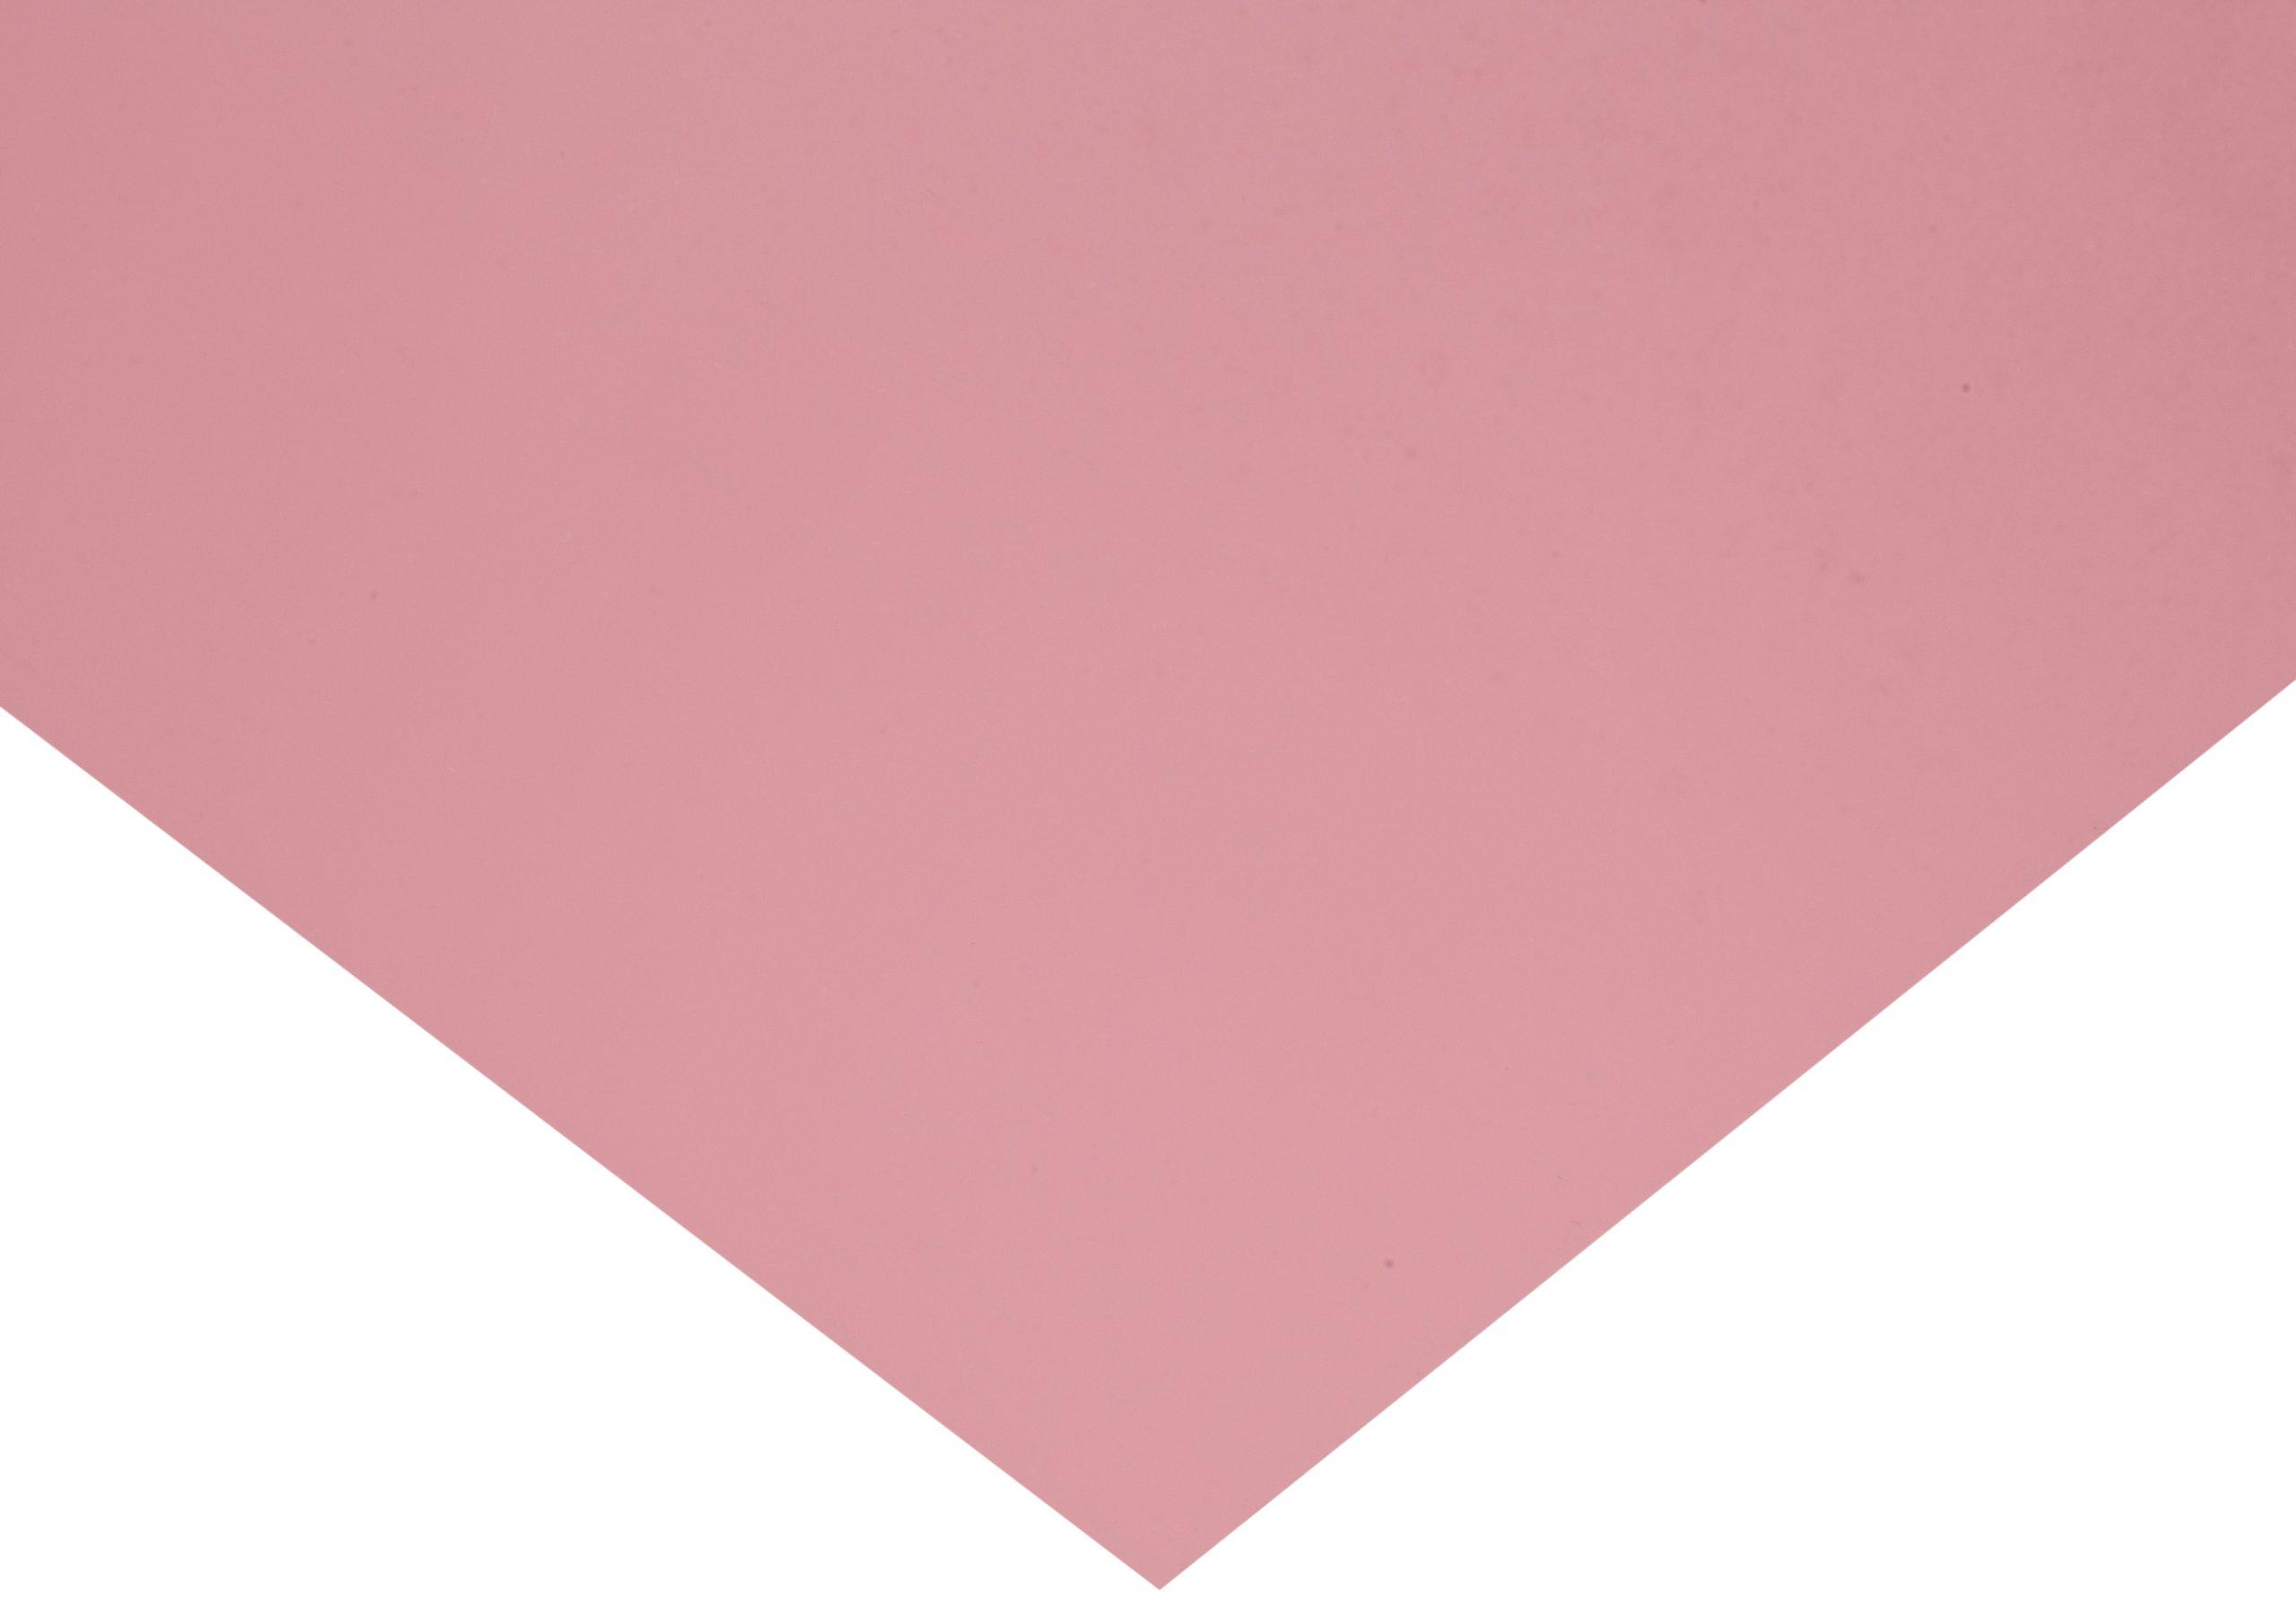 PVC (Polyvinyl Chloride) Shim Stock, Flat